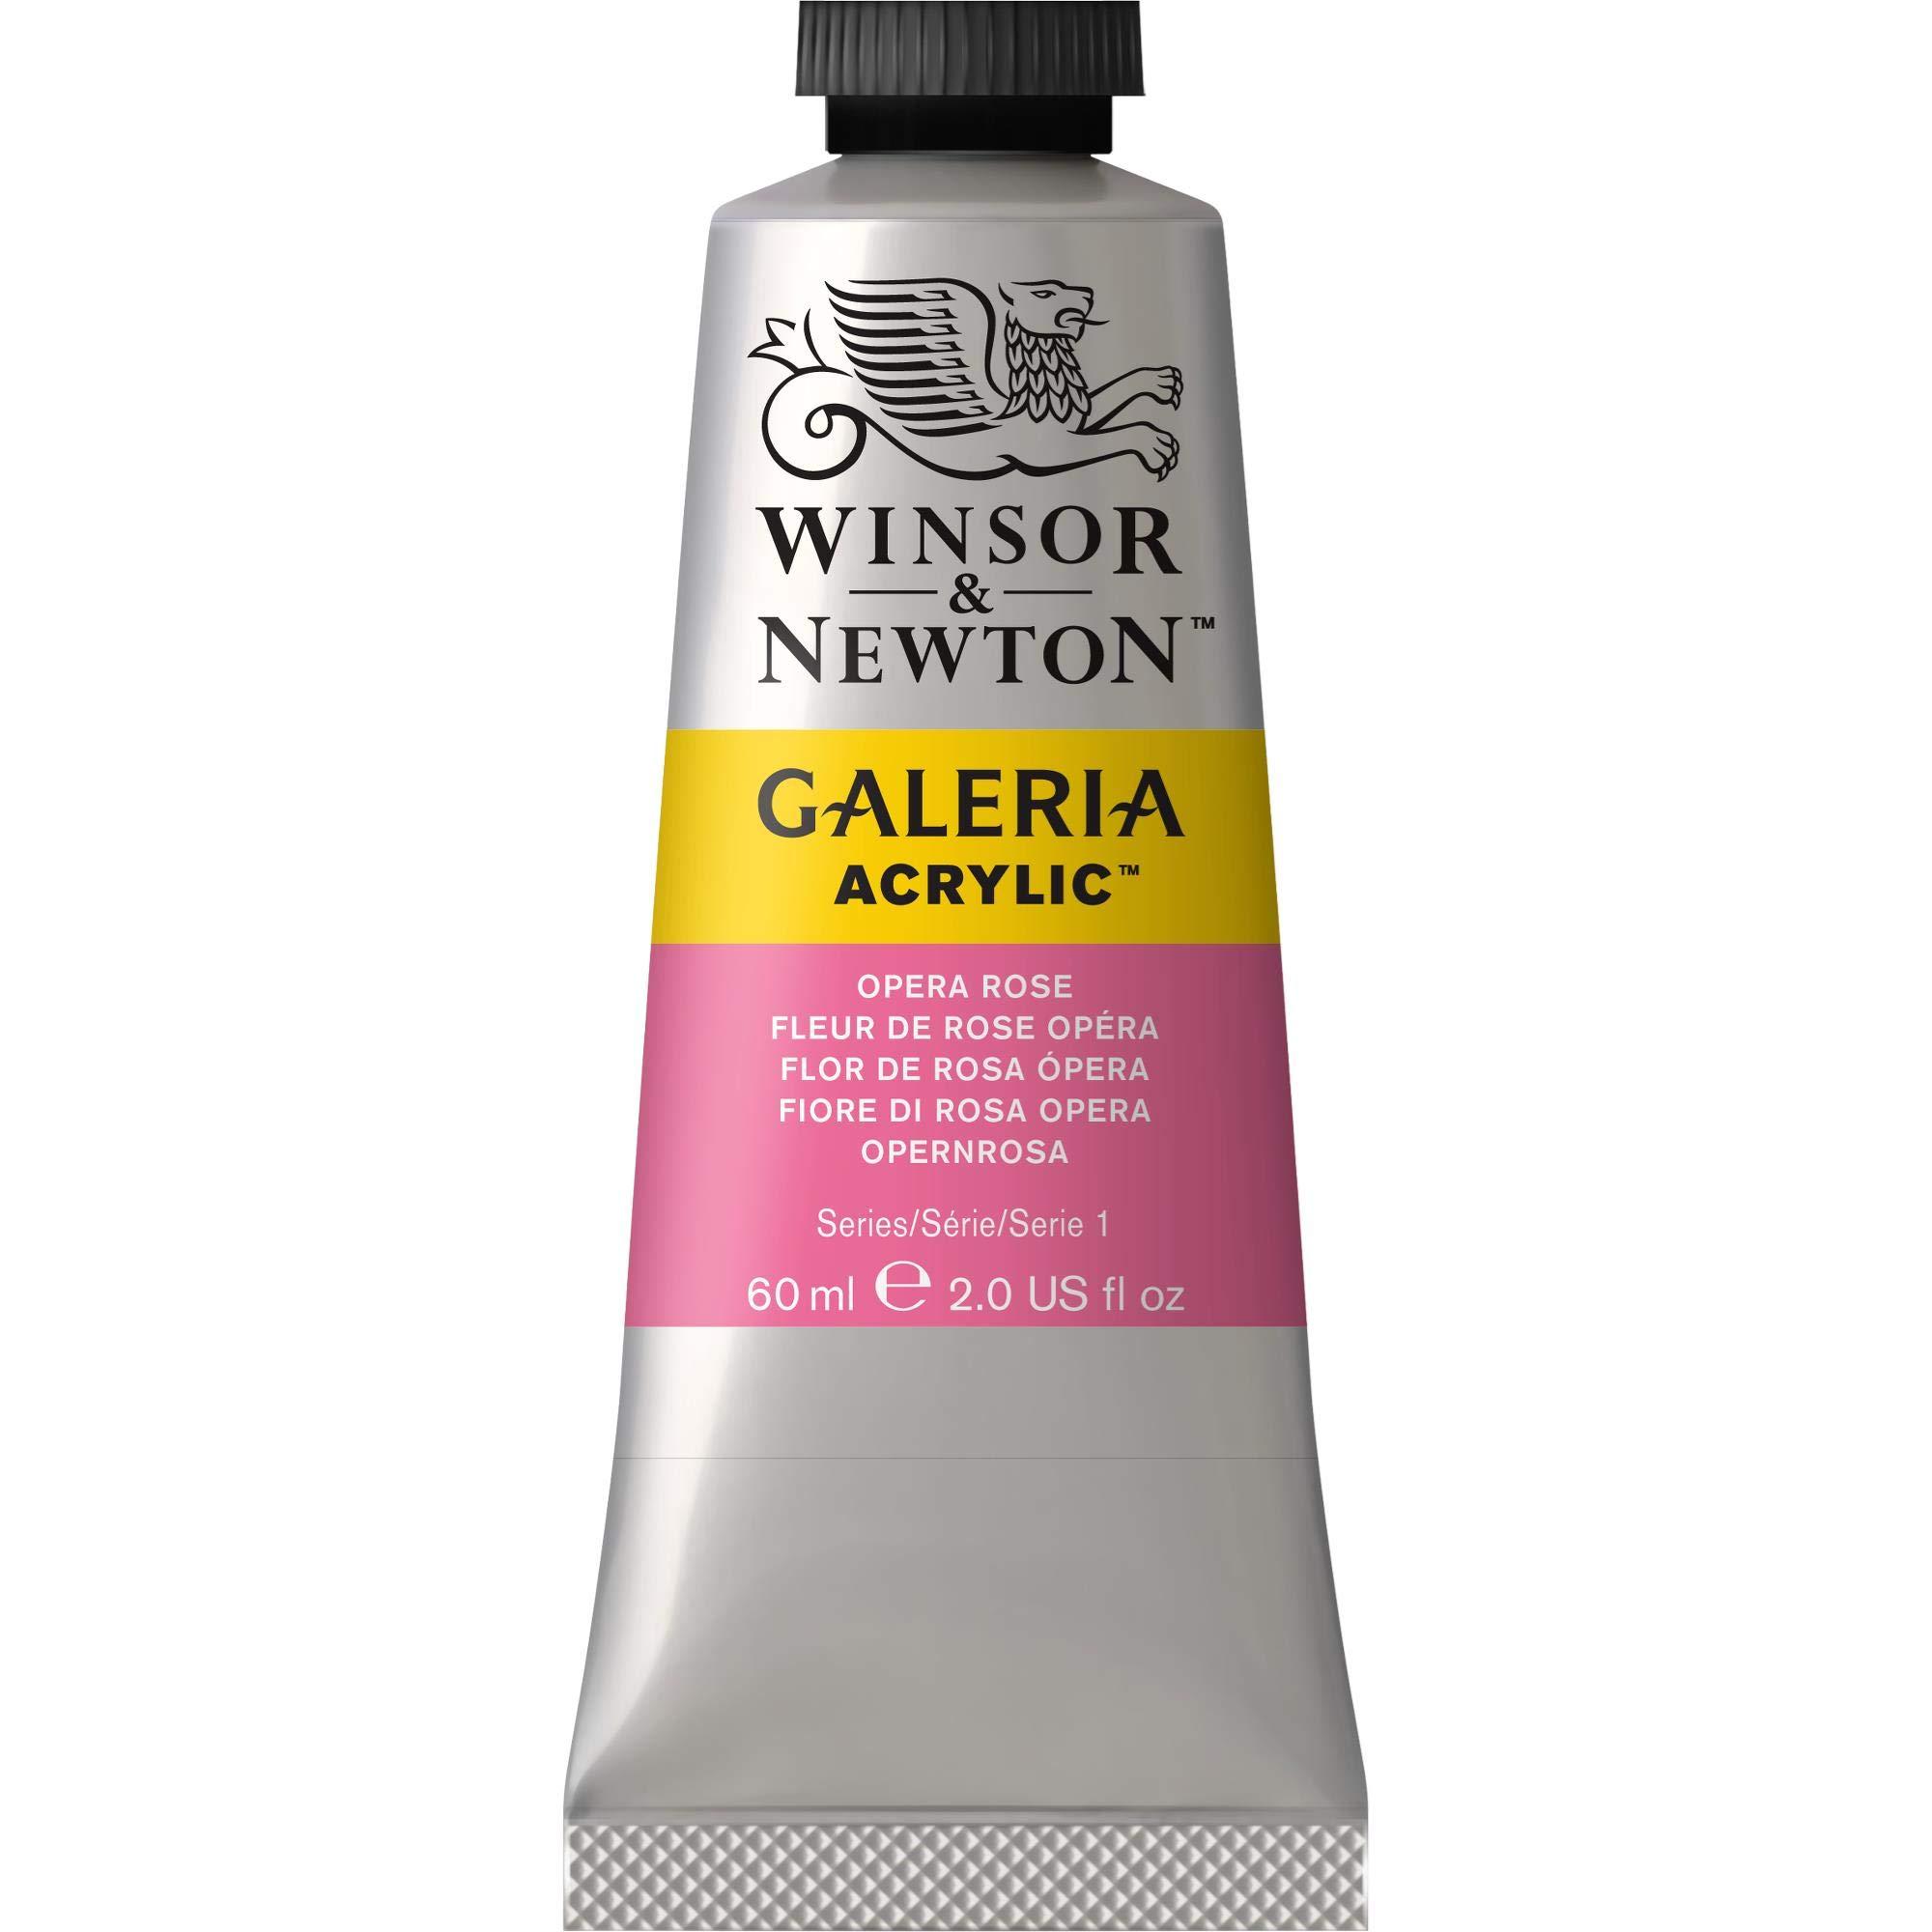 Winsor & Newton, Opera Rose Galeria Acrylic Paint, 60ml Tube, 60-ml, 2 Fl Oz